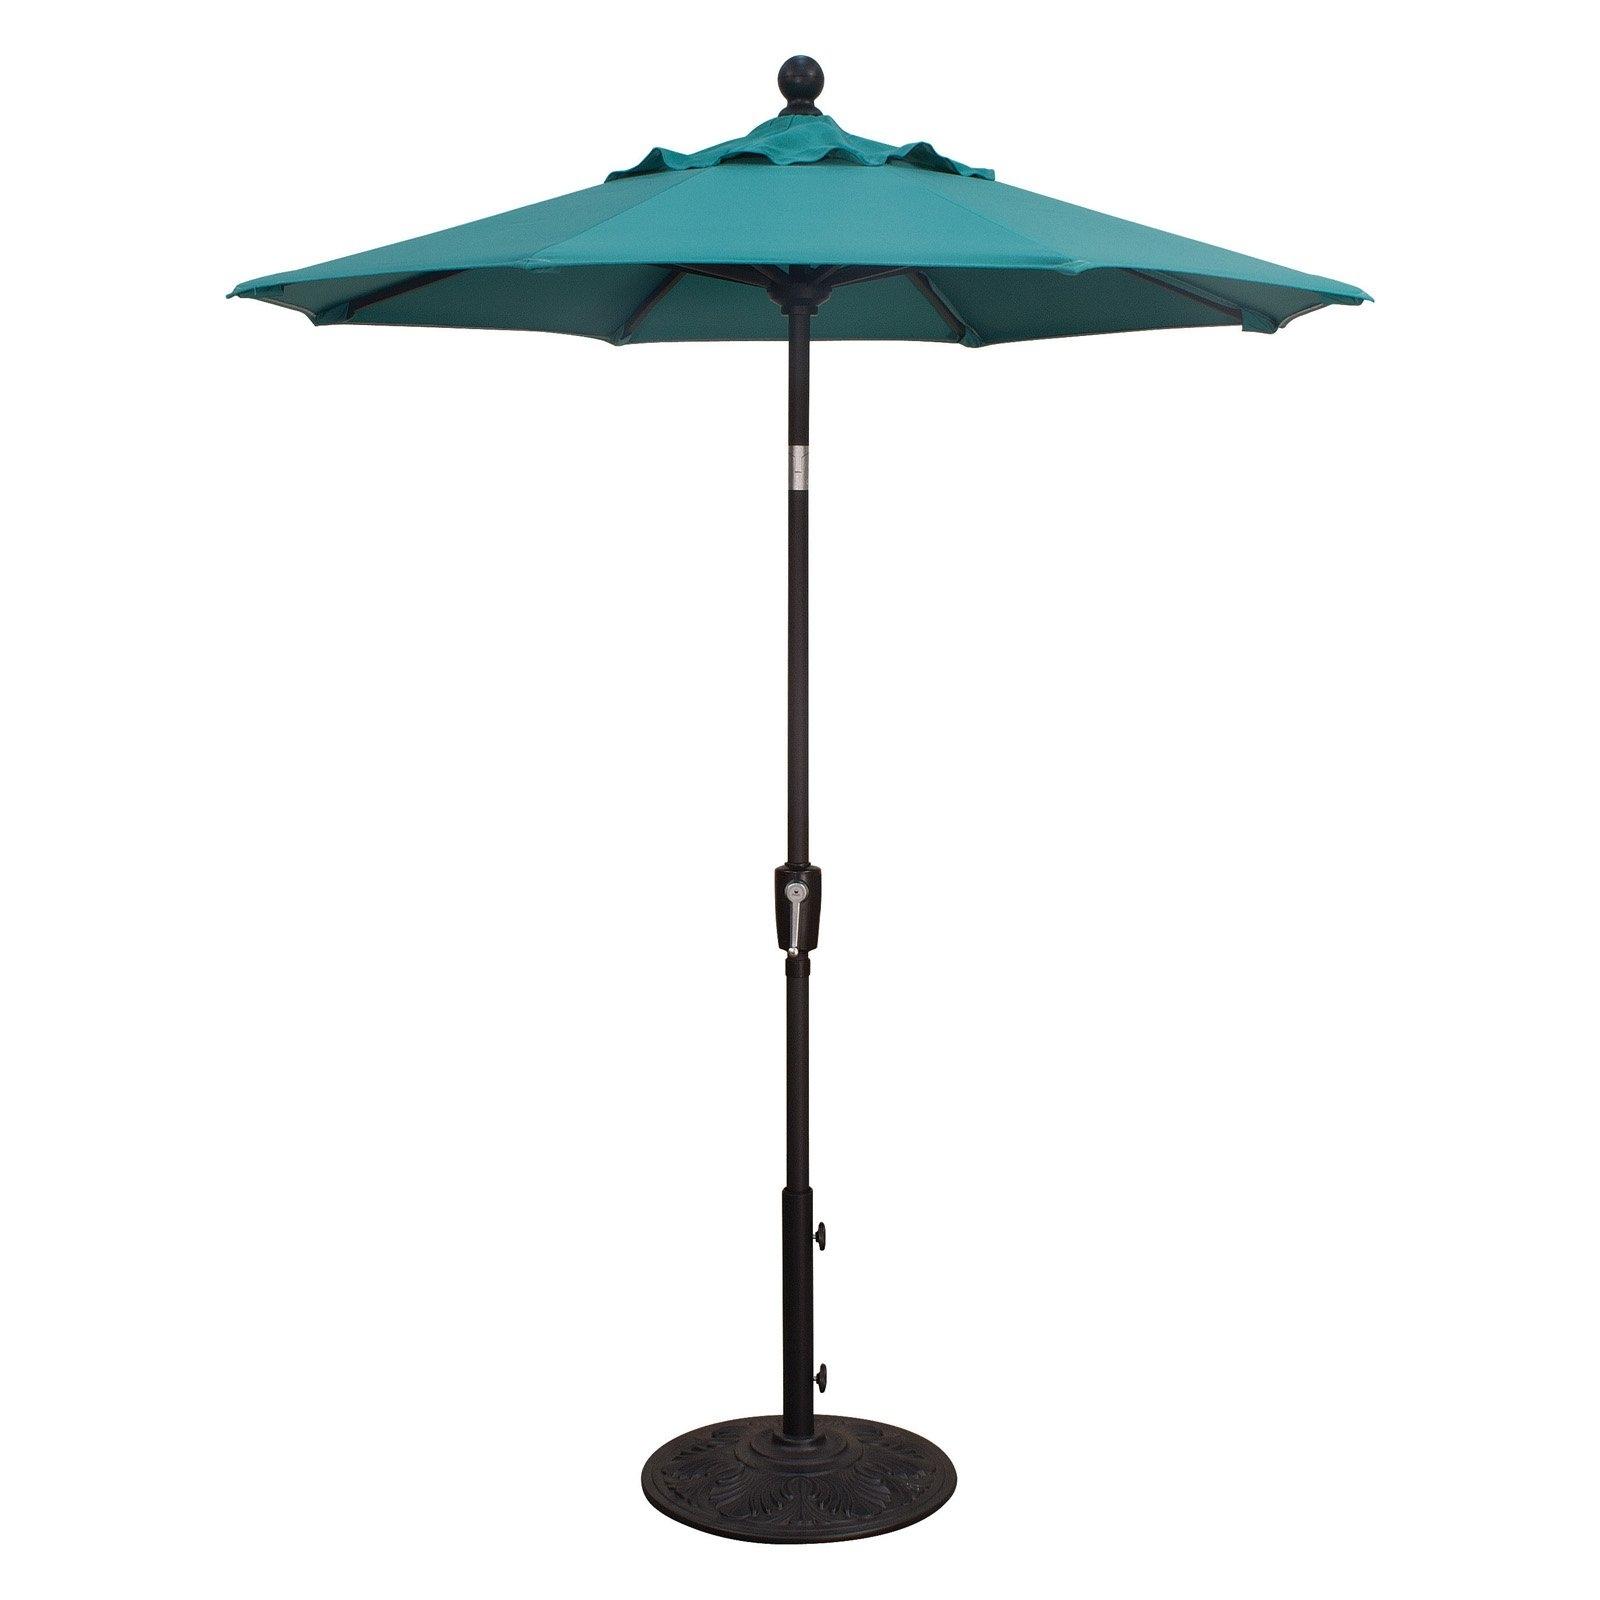 6 Foot Patio Umbrellas • Patio Ideas Throughout Fashionable Yescom Patio Umbrellas (View 19 of 20)